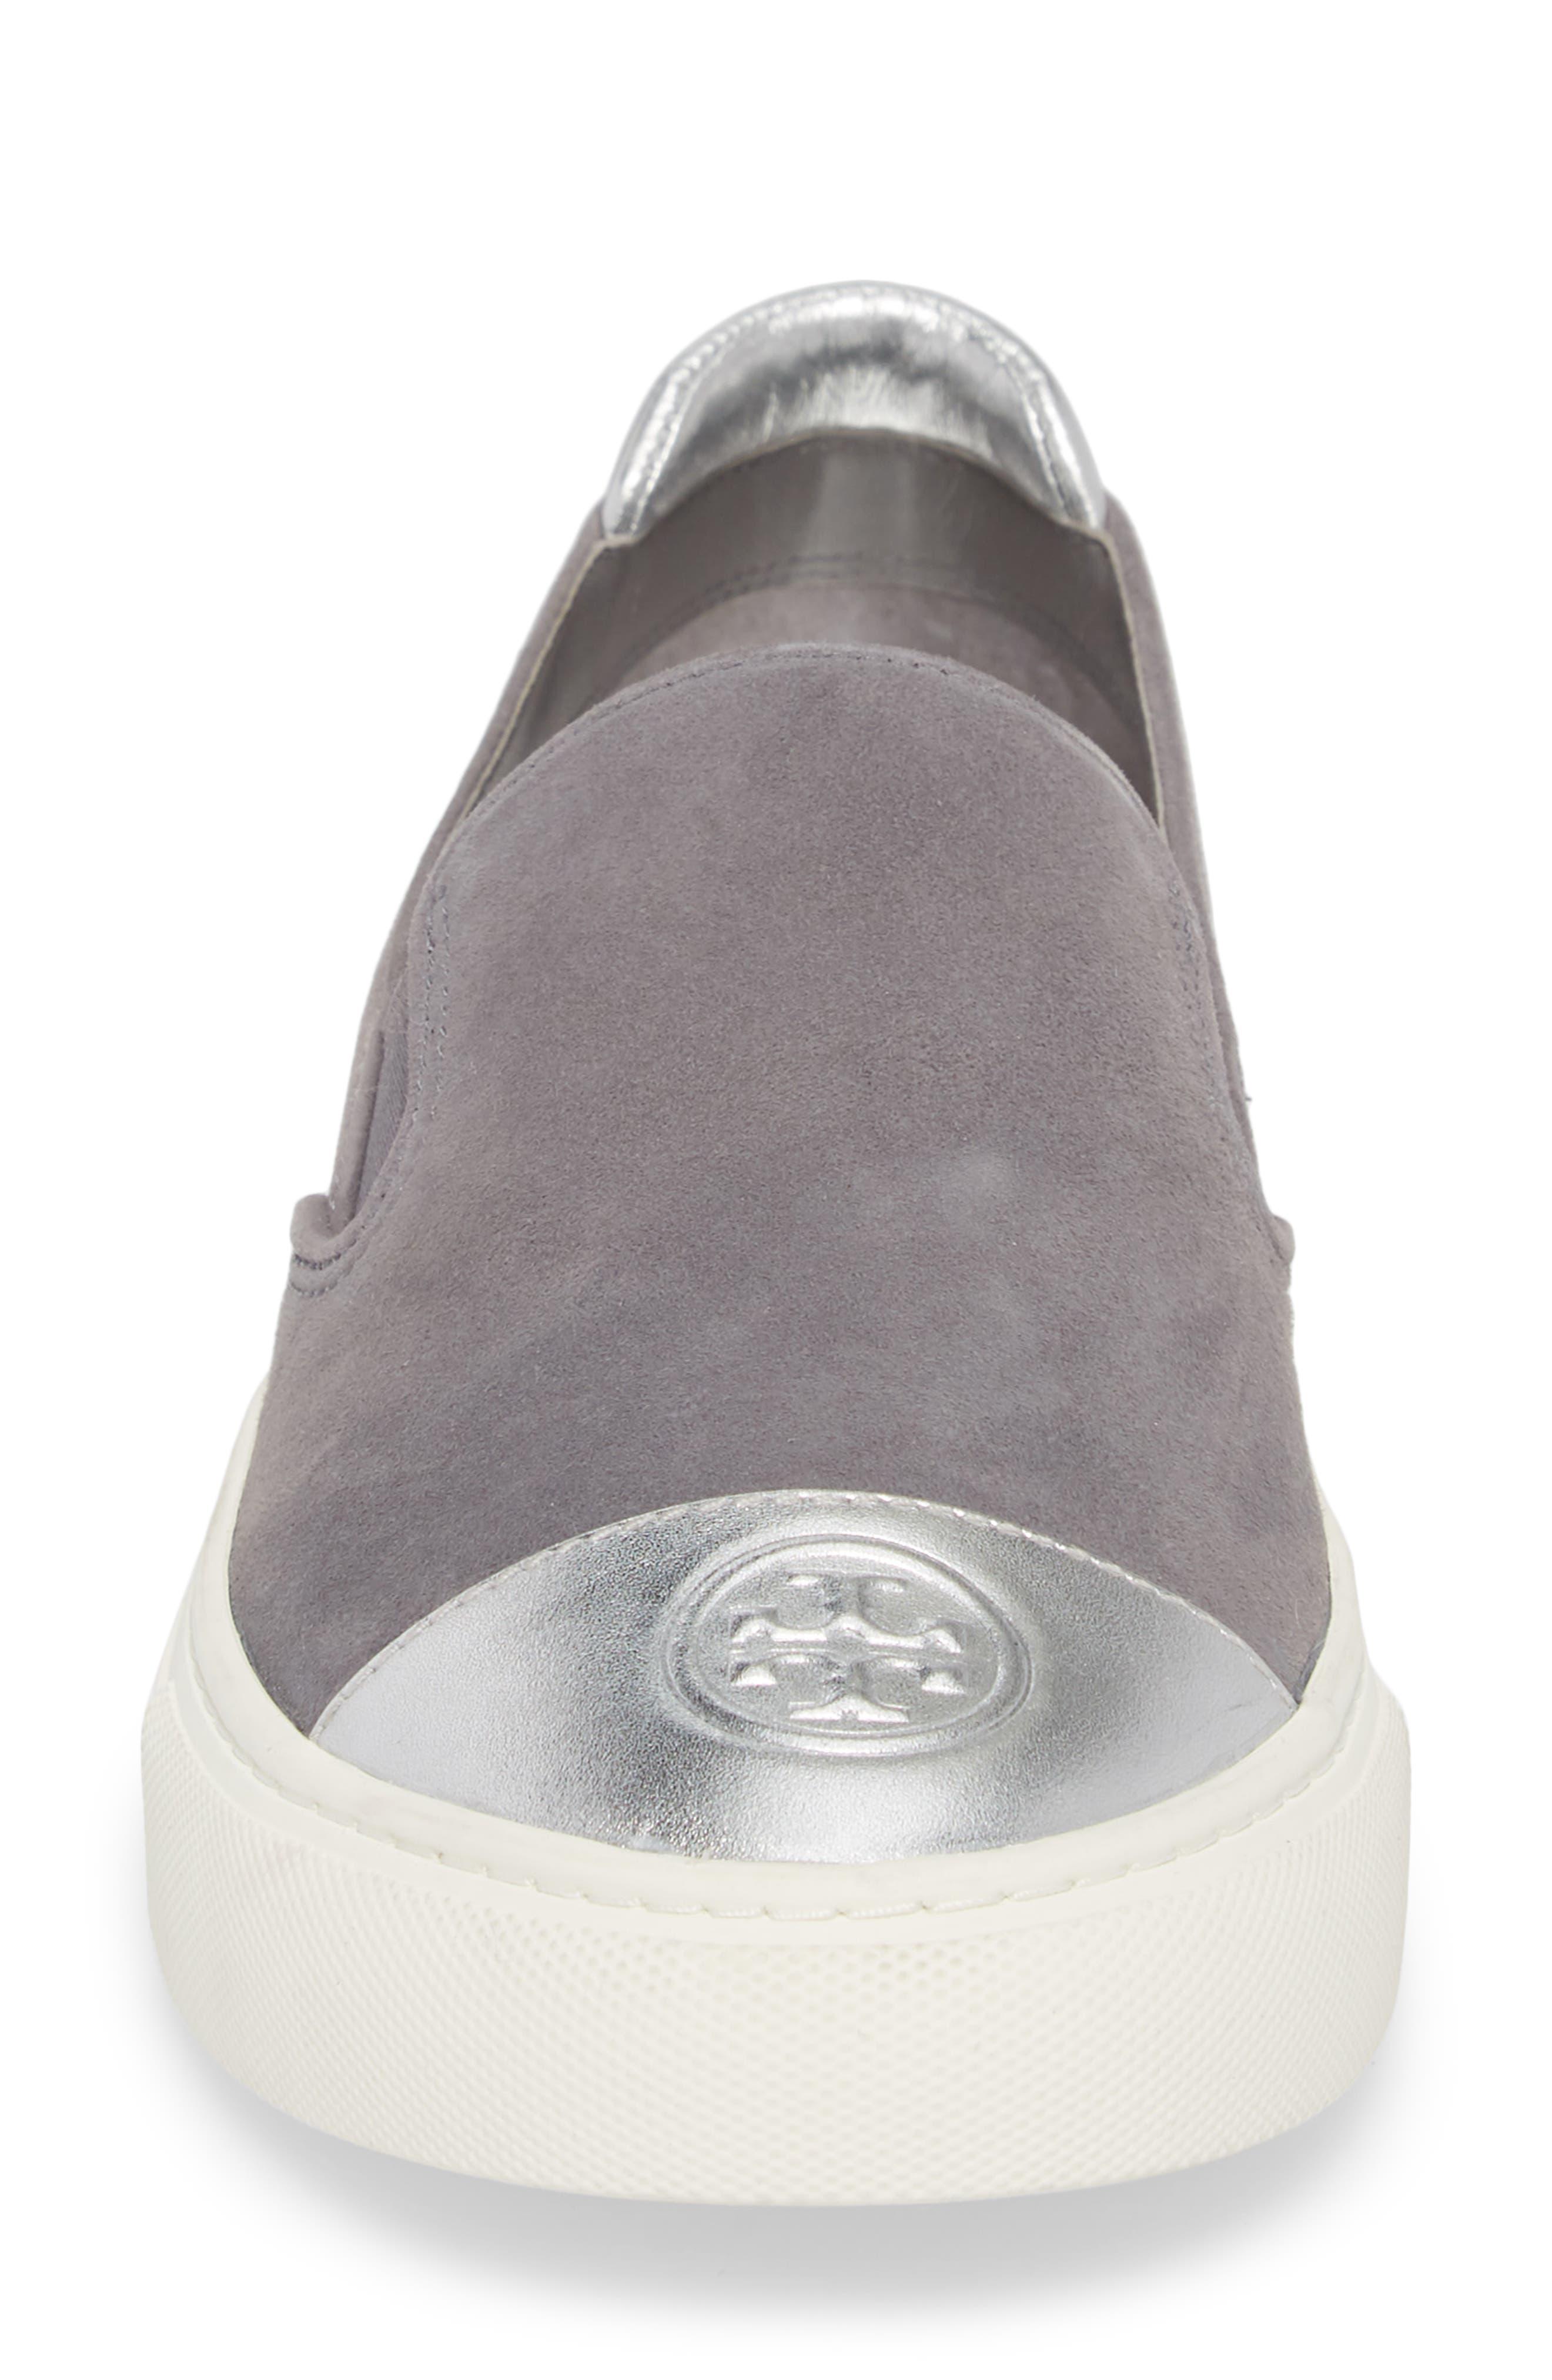 Colorblock Slip-On Sneaker,                             Alternate thumbnail 4, color,                             CARBON/ SILVER